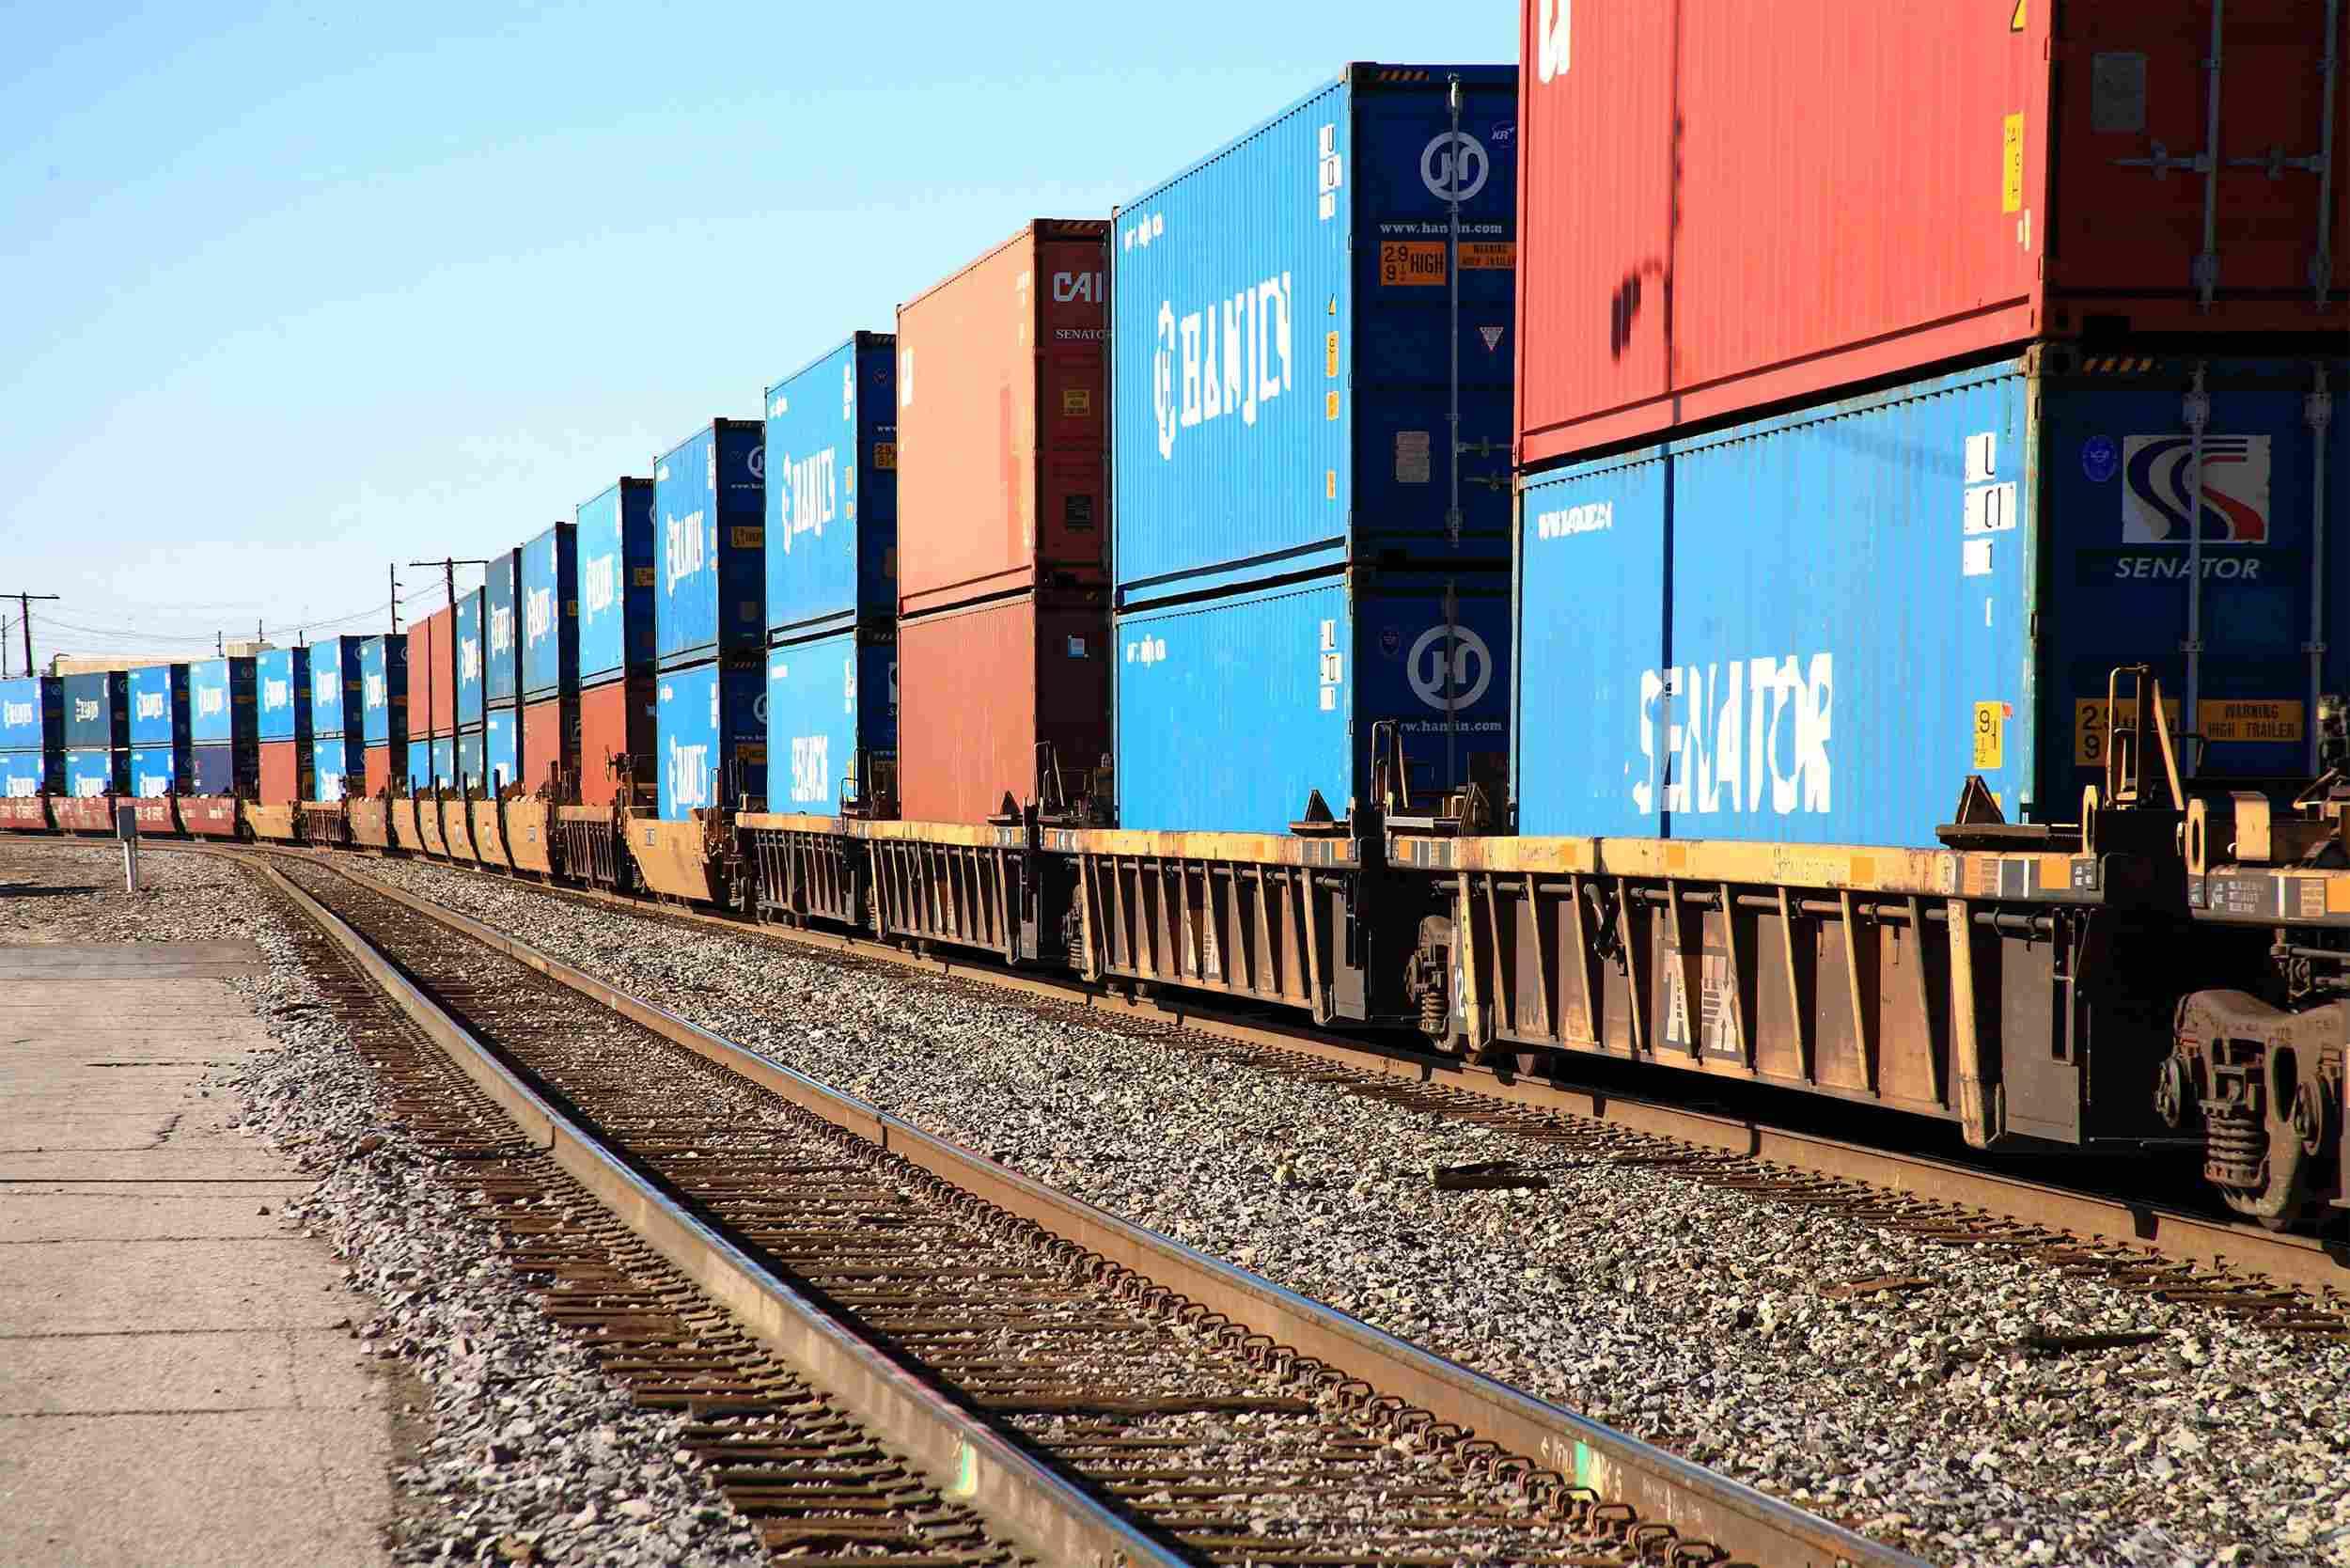 https://speed-trust.com/wp-content/uploads/2015/09/Rail-transport-2.jpg